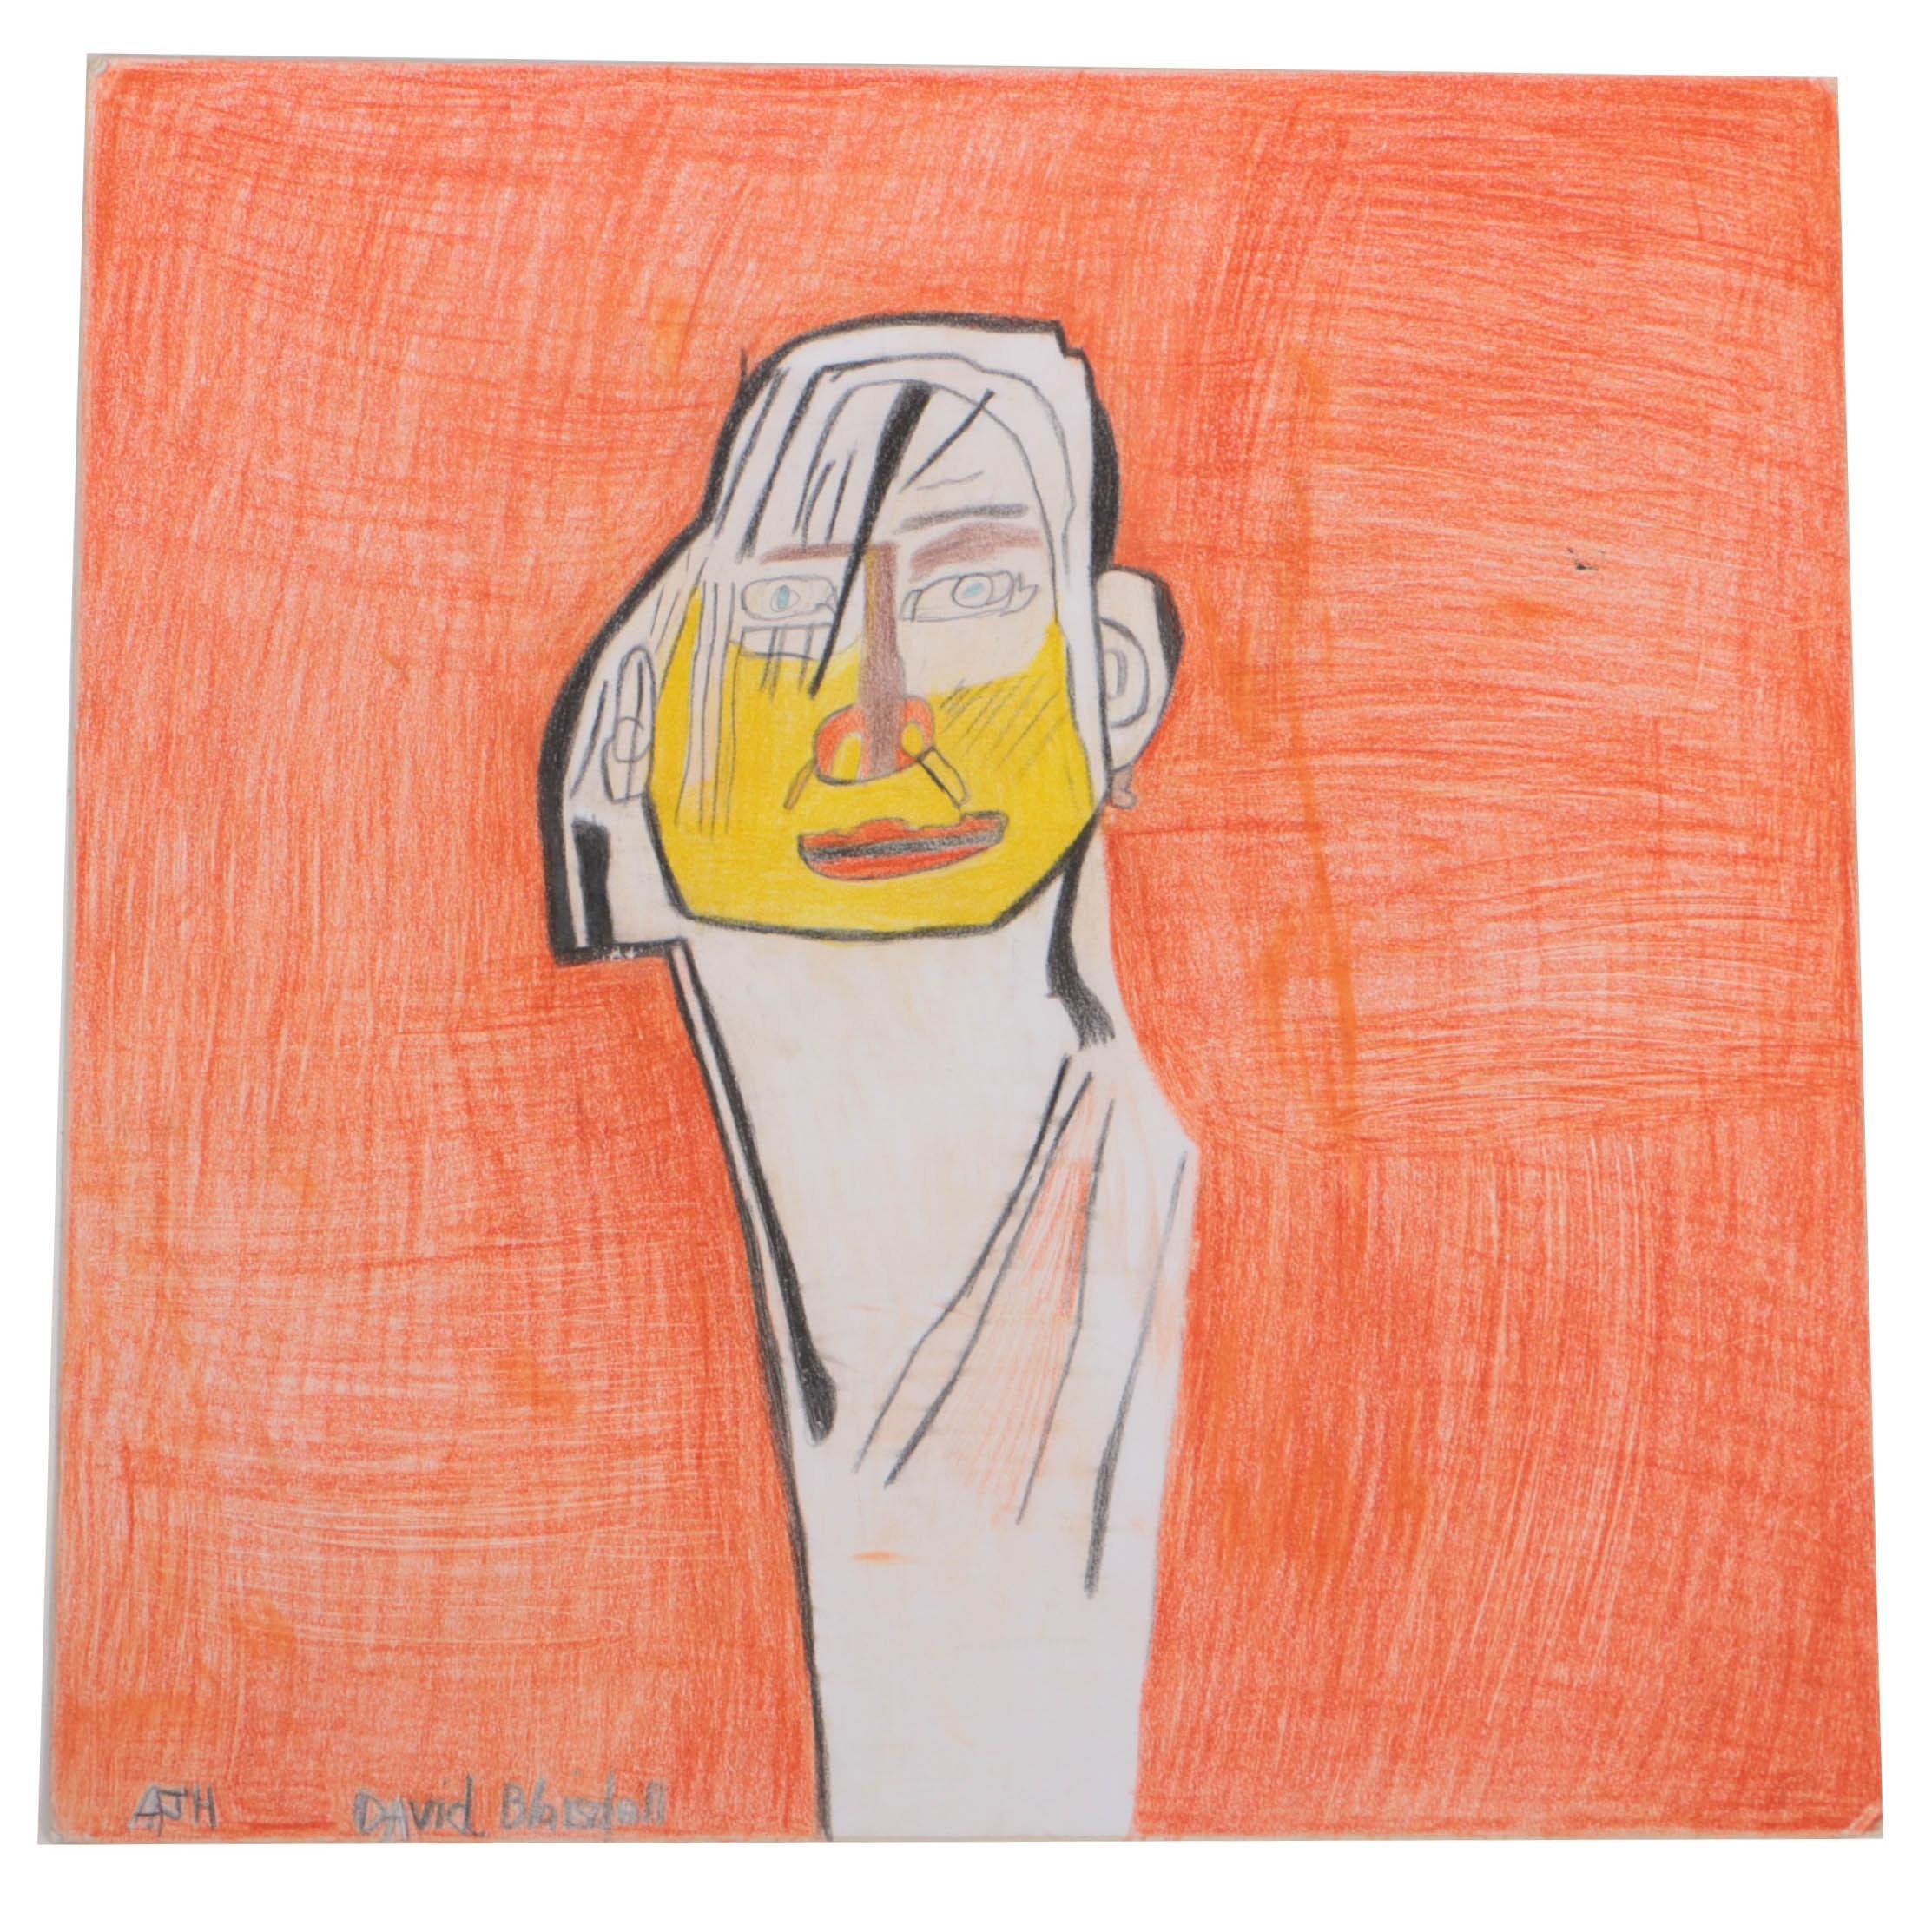 "Andrew Hostick 2015 Colored Pencil on Illustration Board ""David Blaisdell"""